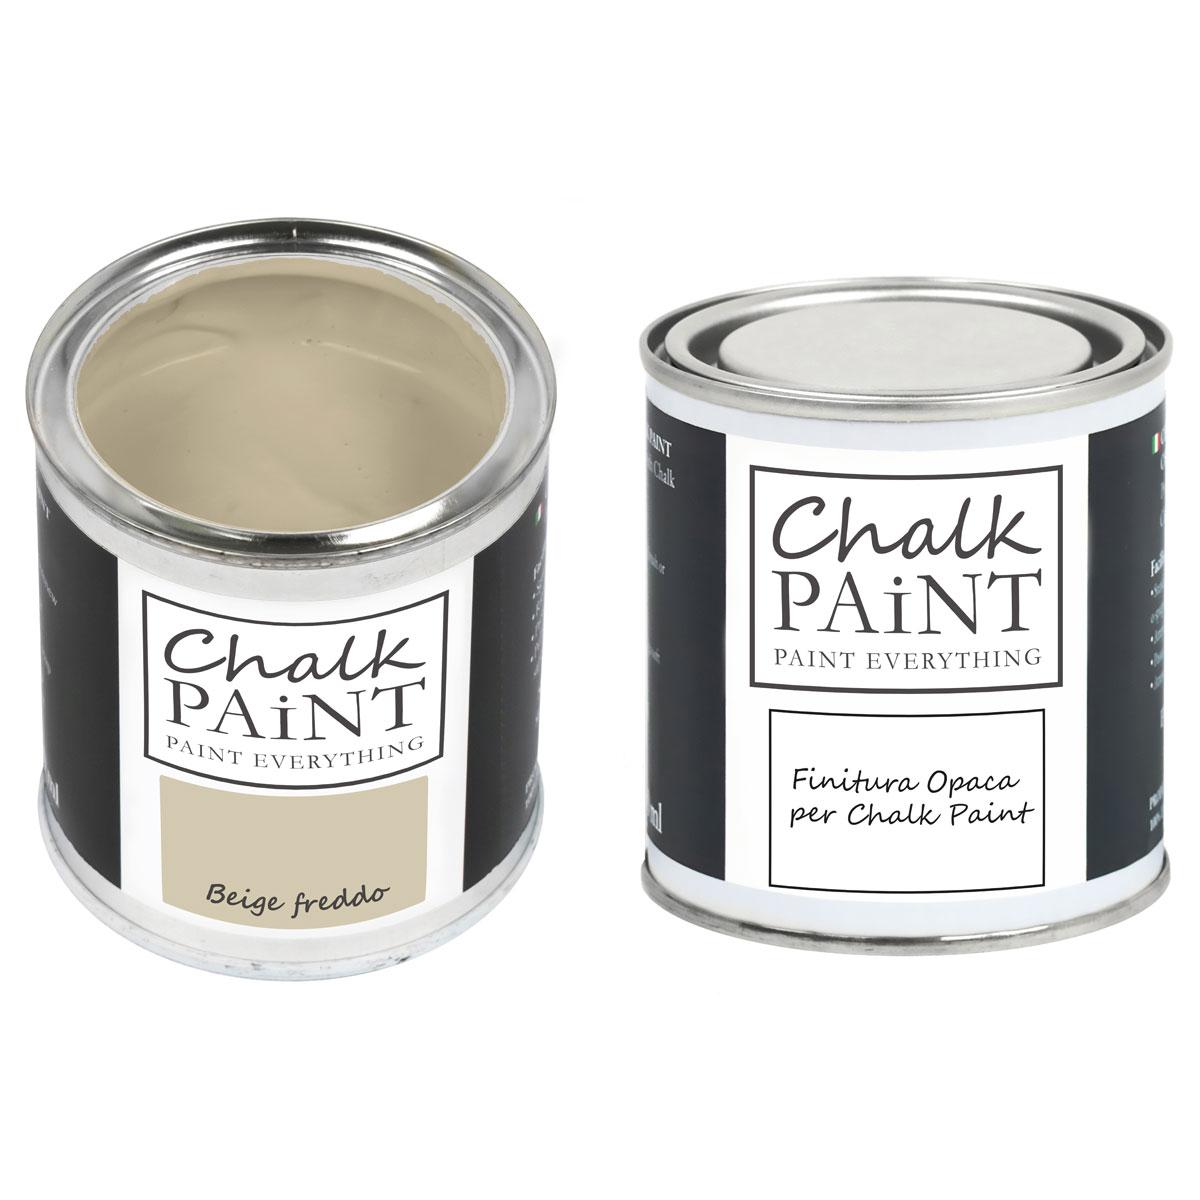 Chalk Paint Beige Freddo decora facile